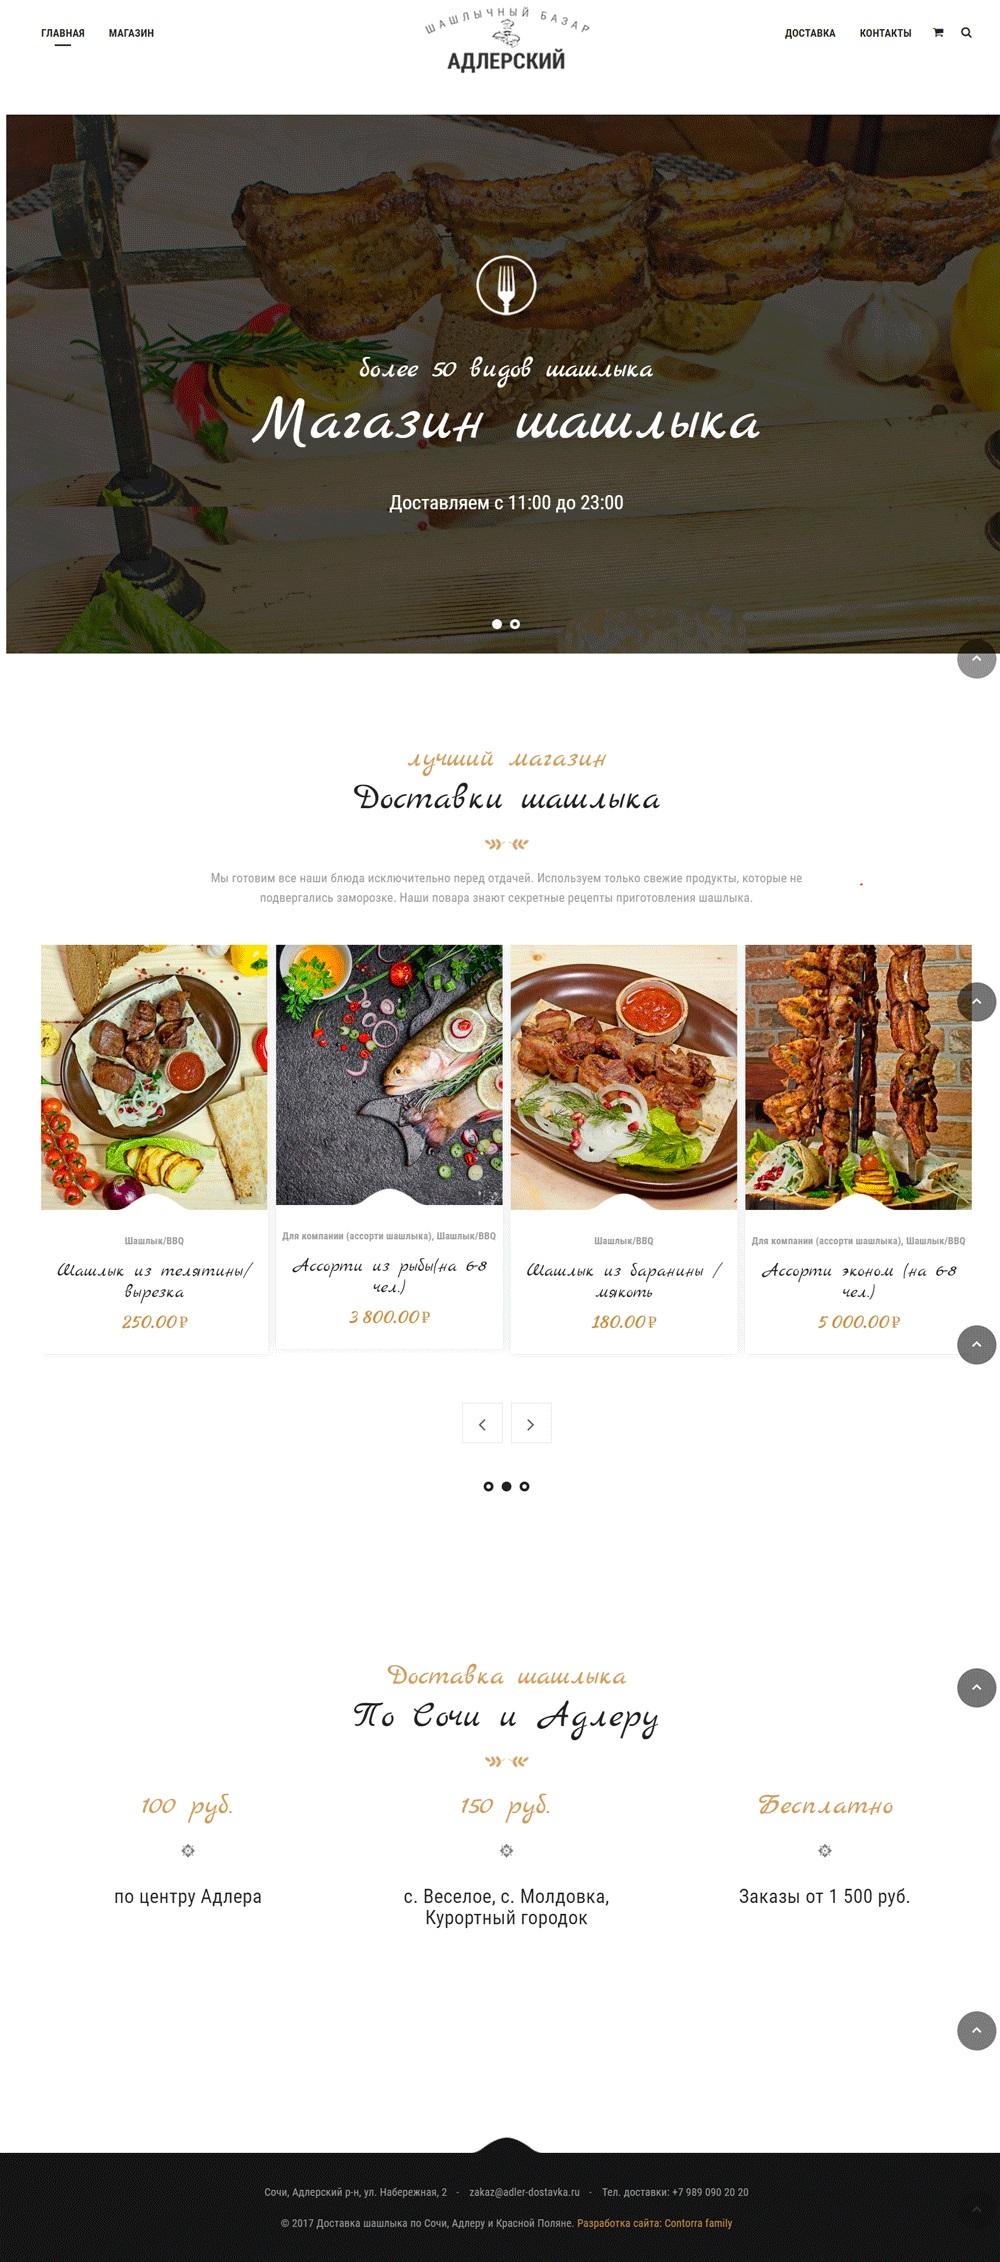 b3db61e71600 Создание сайта для кафе Шашлычный Базар (Адлер). Шашлычный базар Адлерский